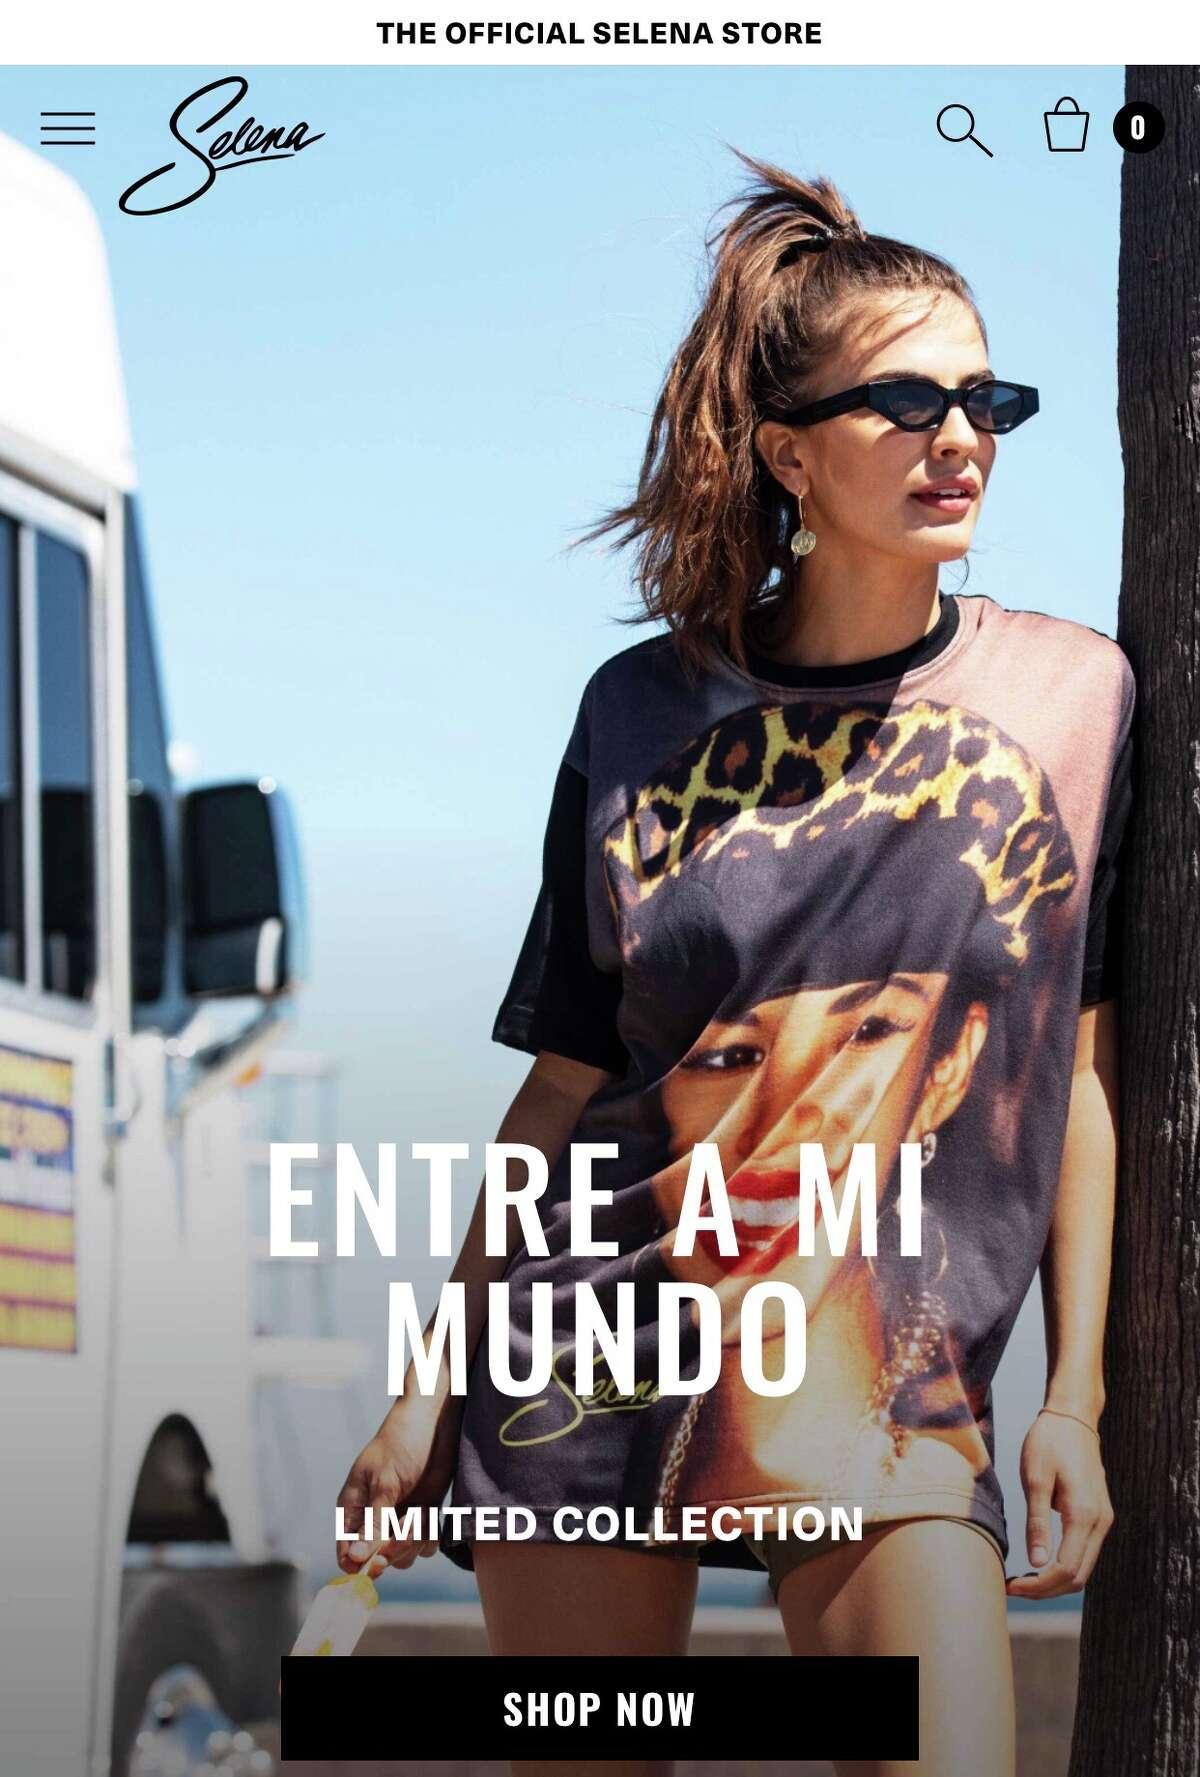 The new Selena Entre a Mi Mundo collection features a photo taken in Houston